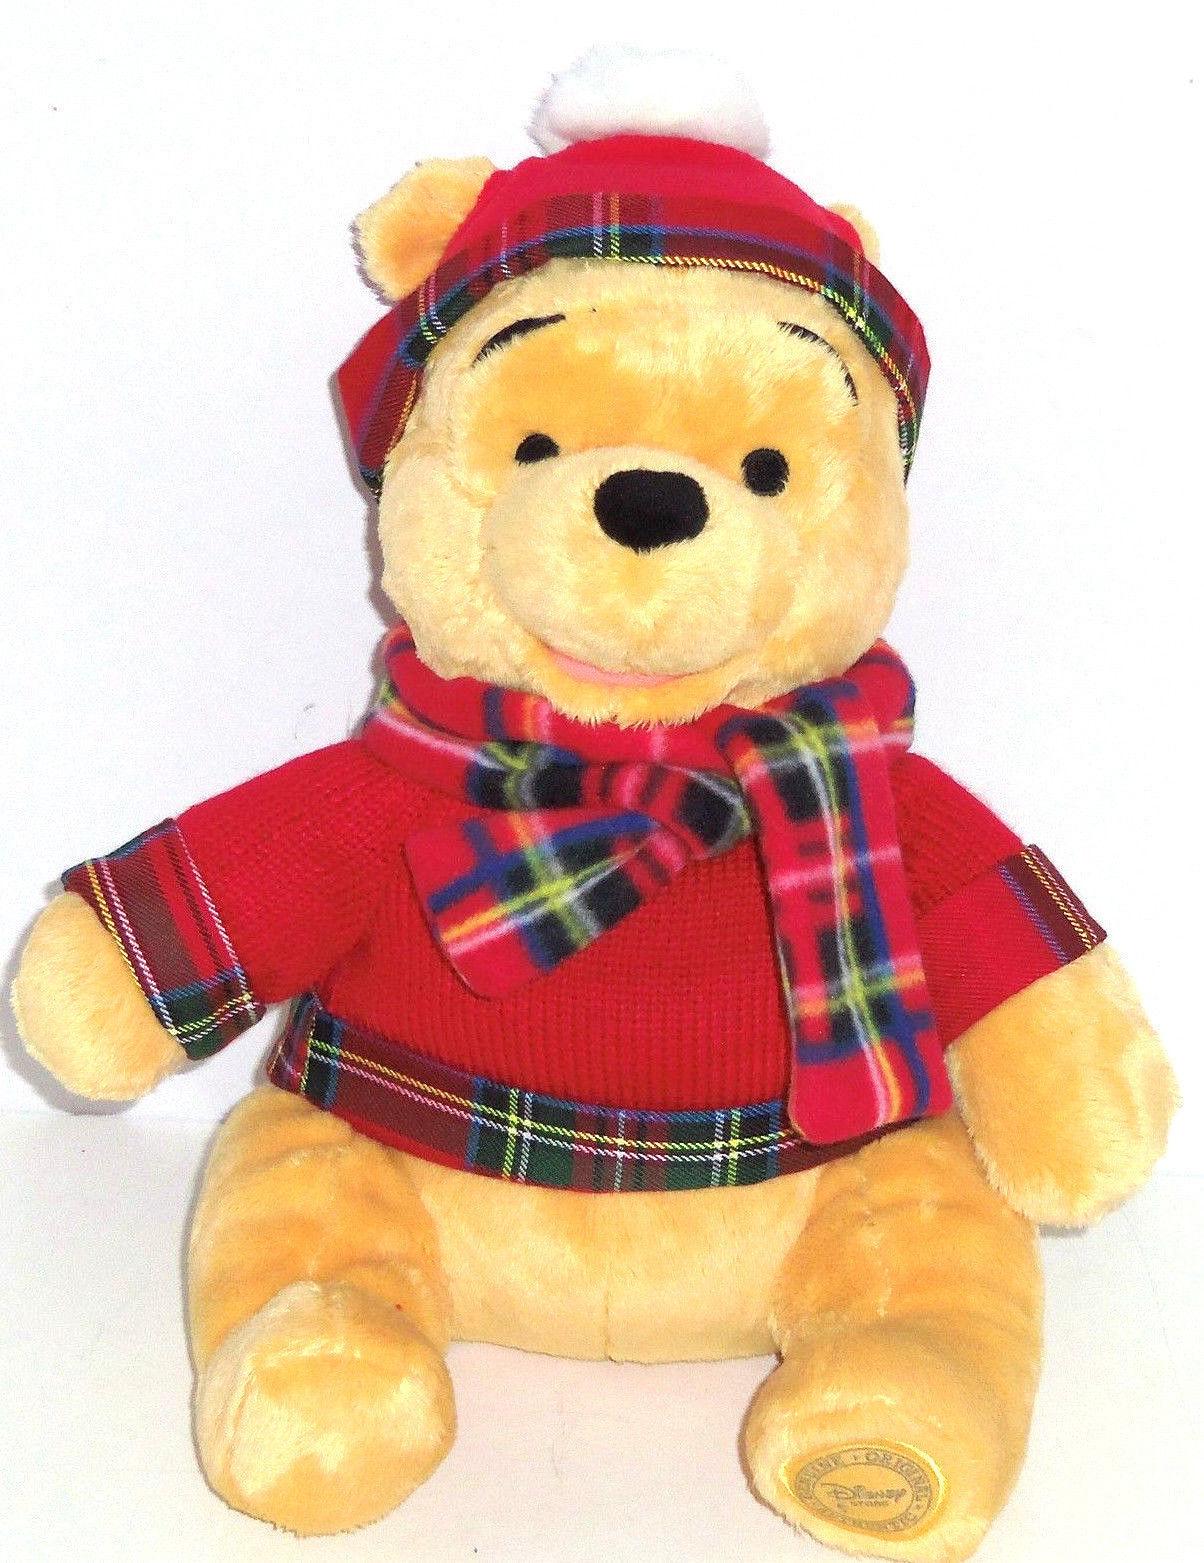 Winnie The Pooh Toys : Disney store winnie the pooh christmas plush toy new